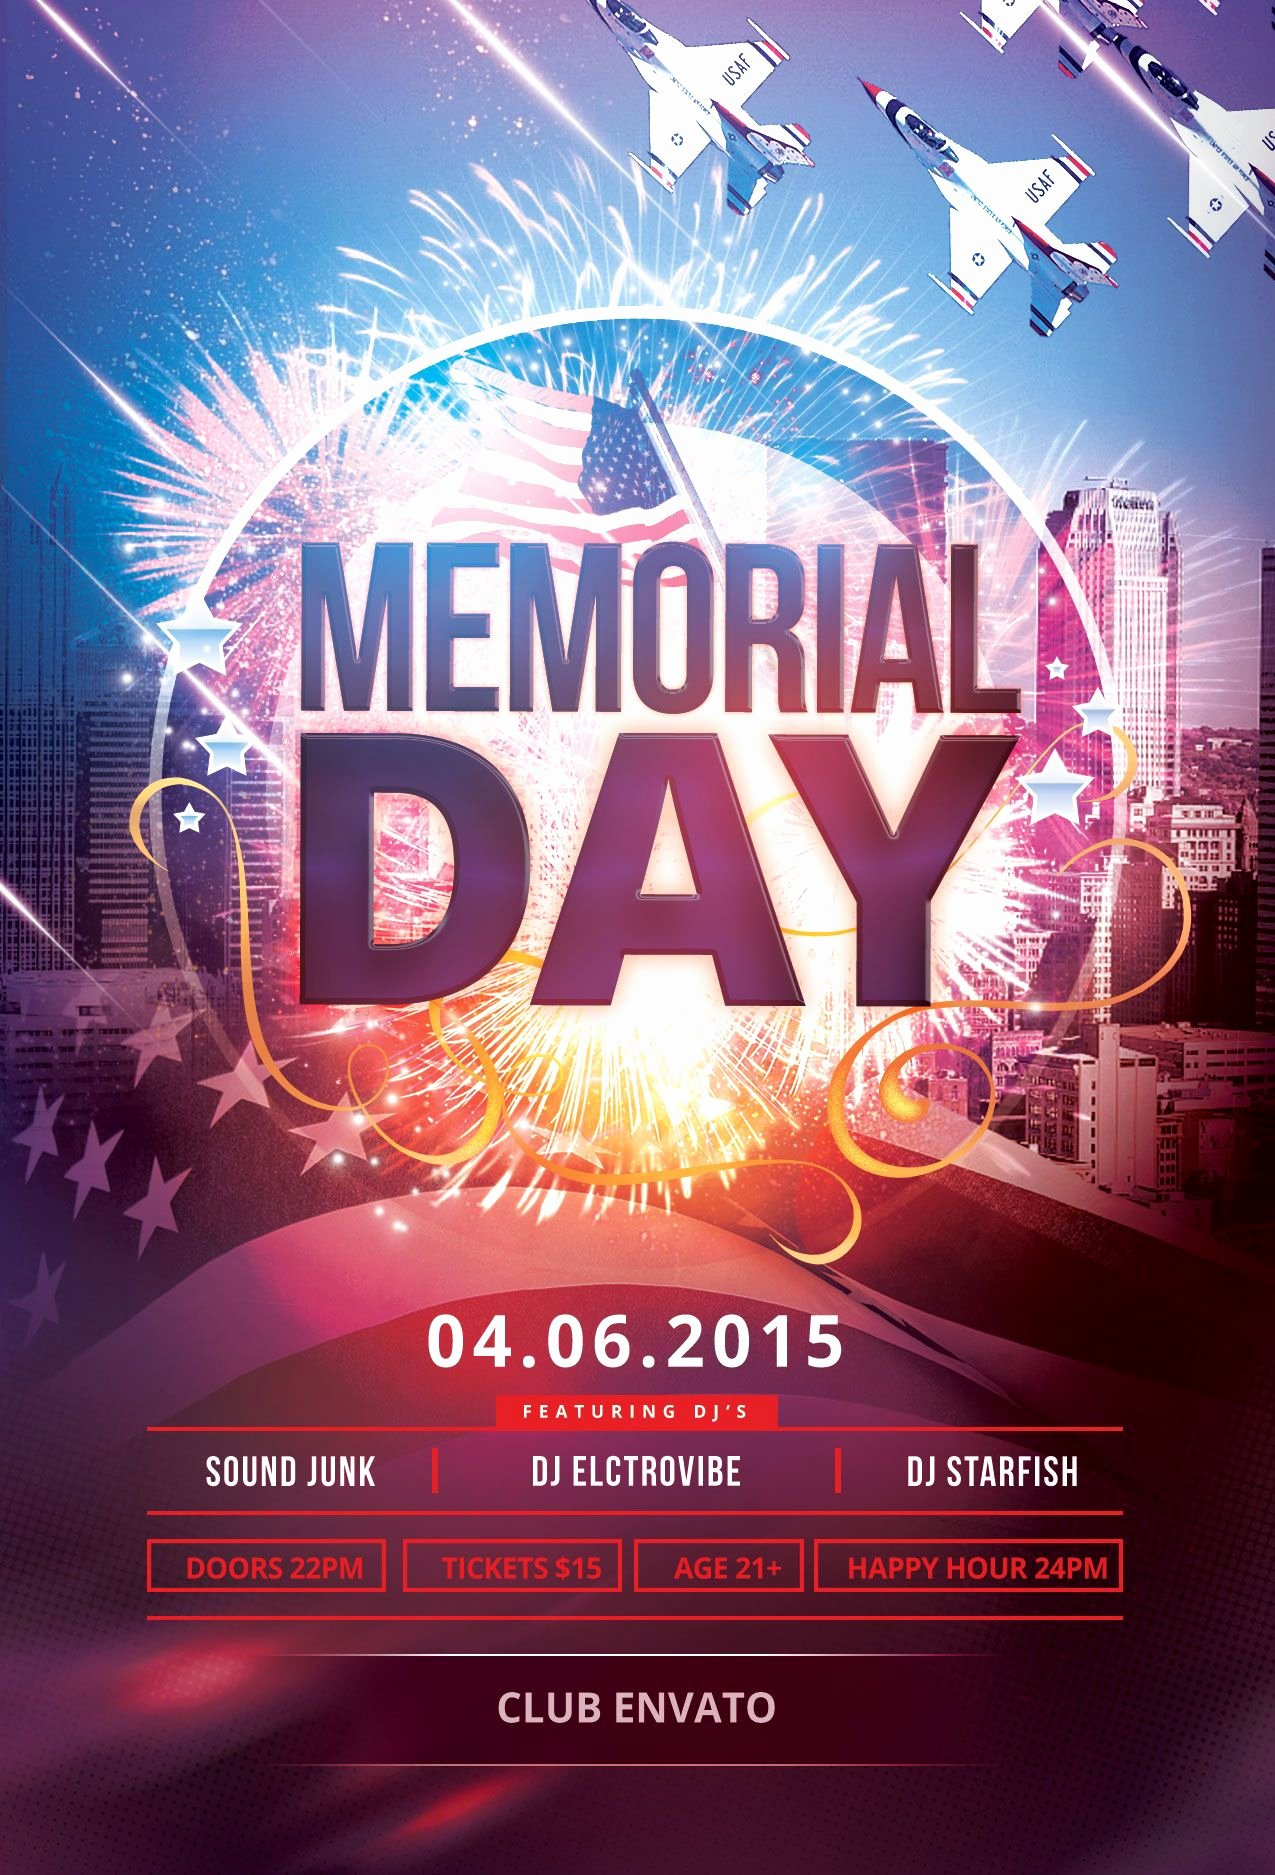 Memorial Day Flyer Template Free Elegant Memorial Day Flyer Template Download Psd File $6